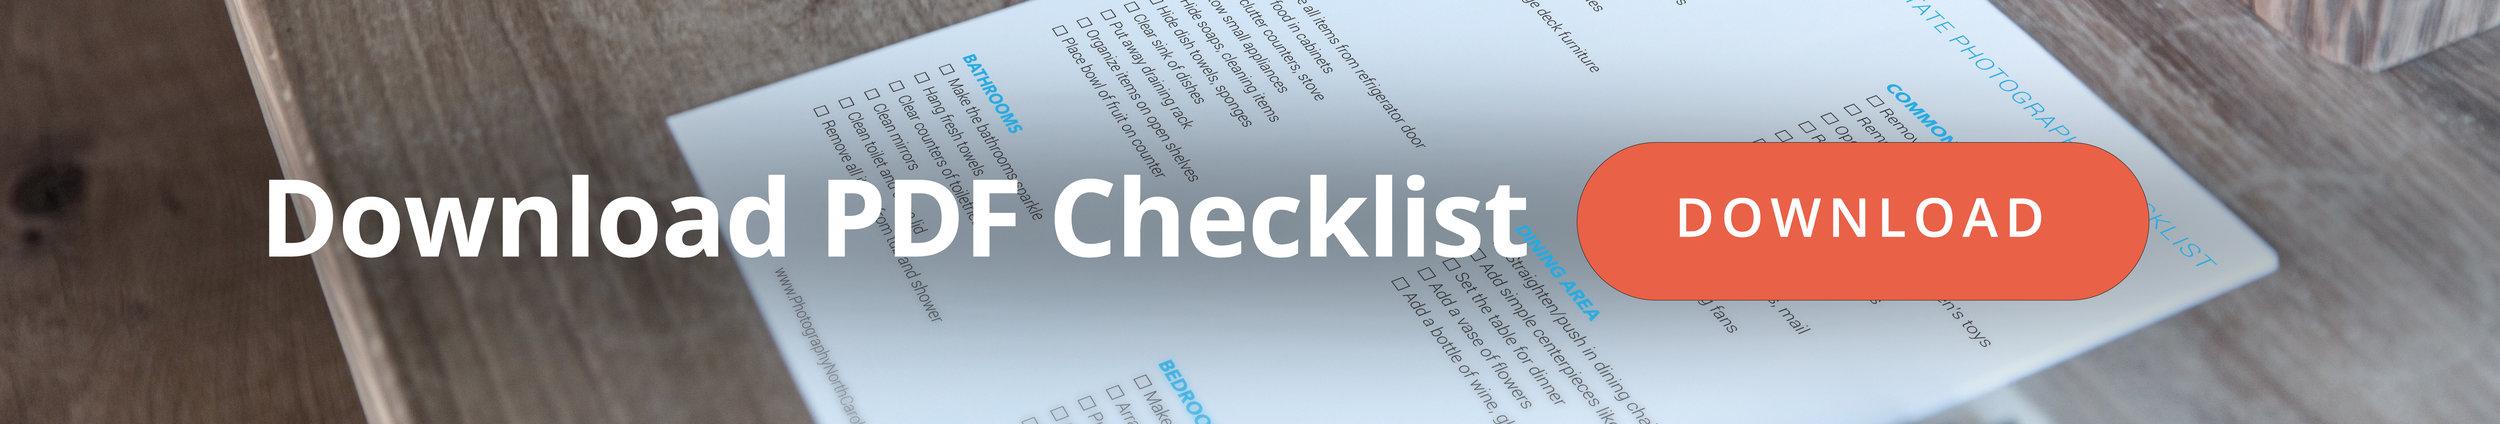 real-estate-photography-checklist.jpg